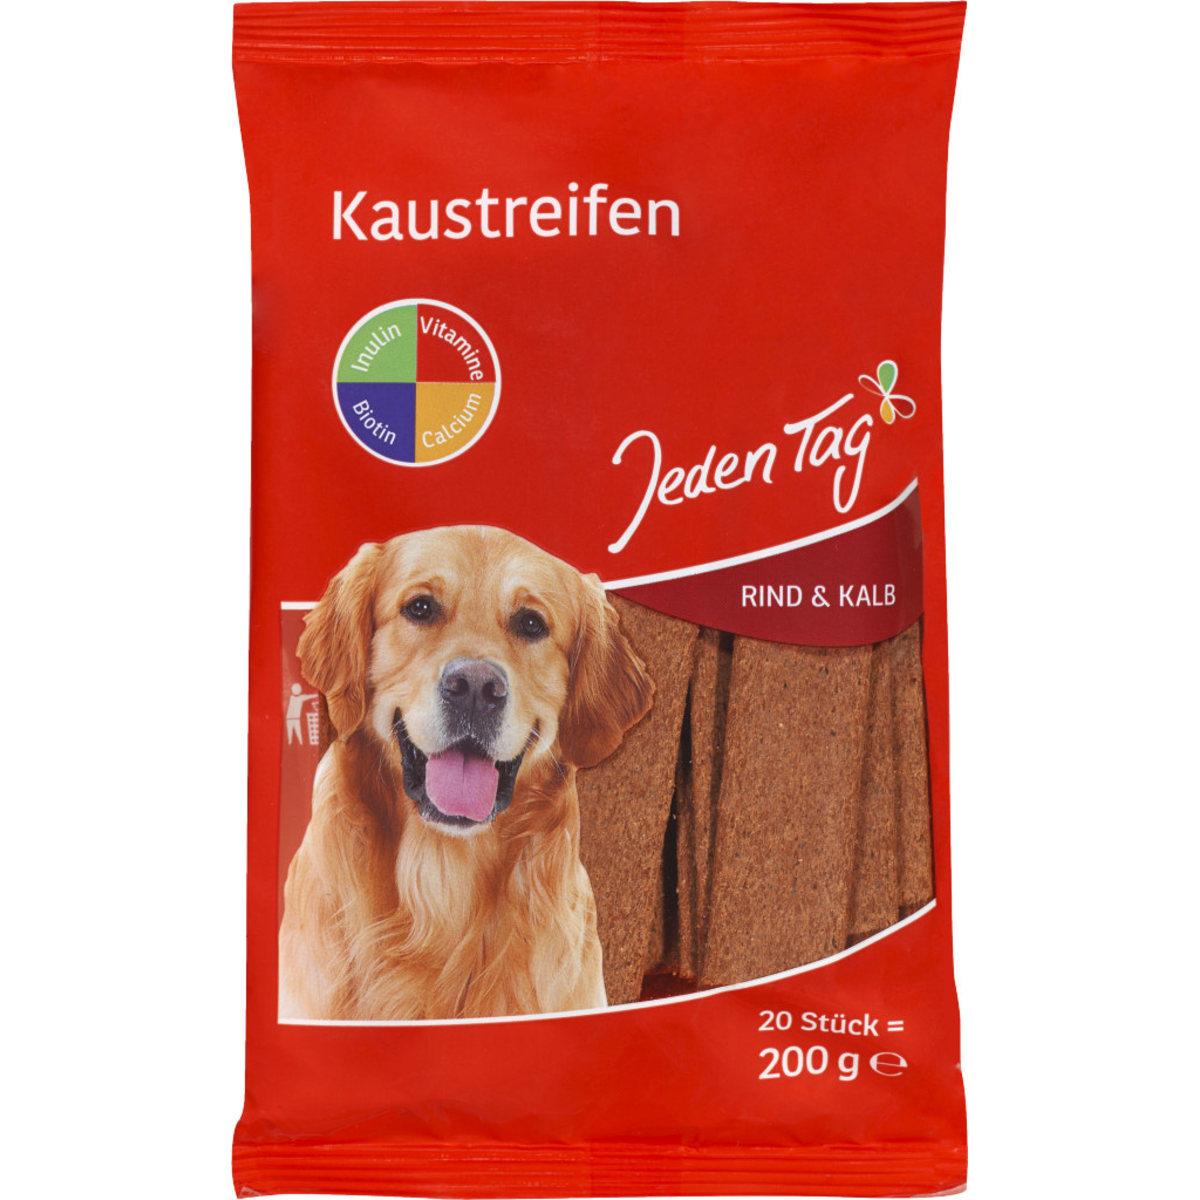 JT Kaustreifen Rind & Kalb 20 Stück